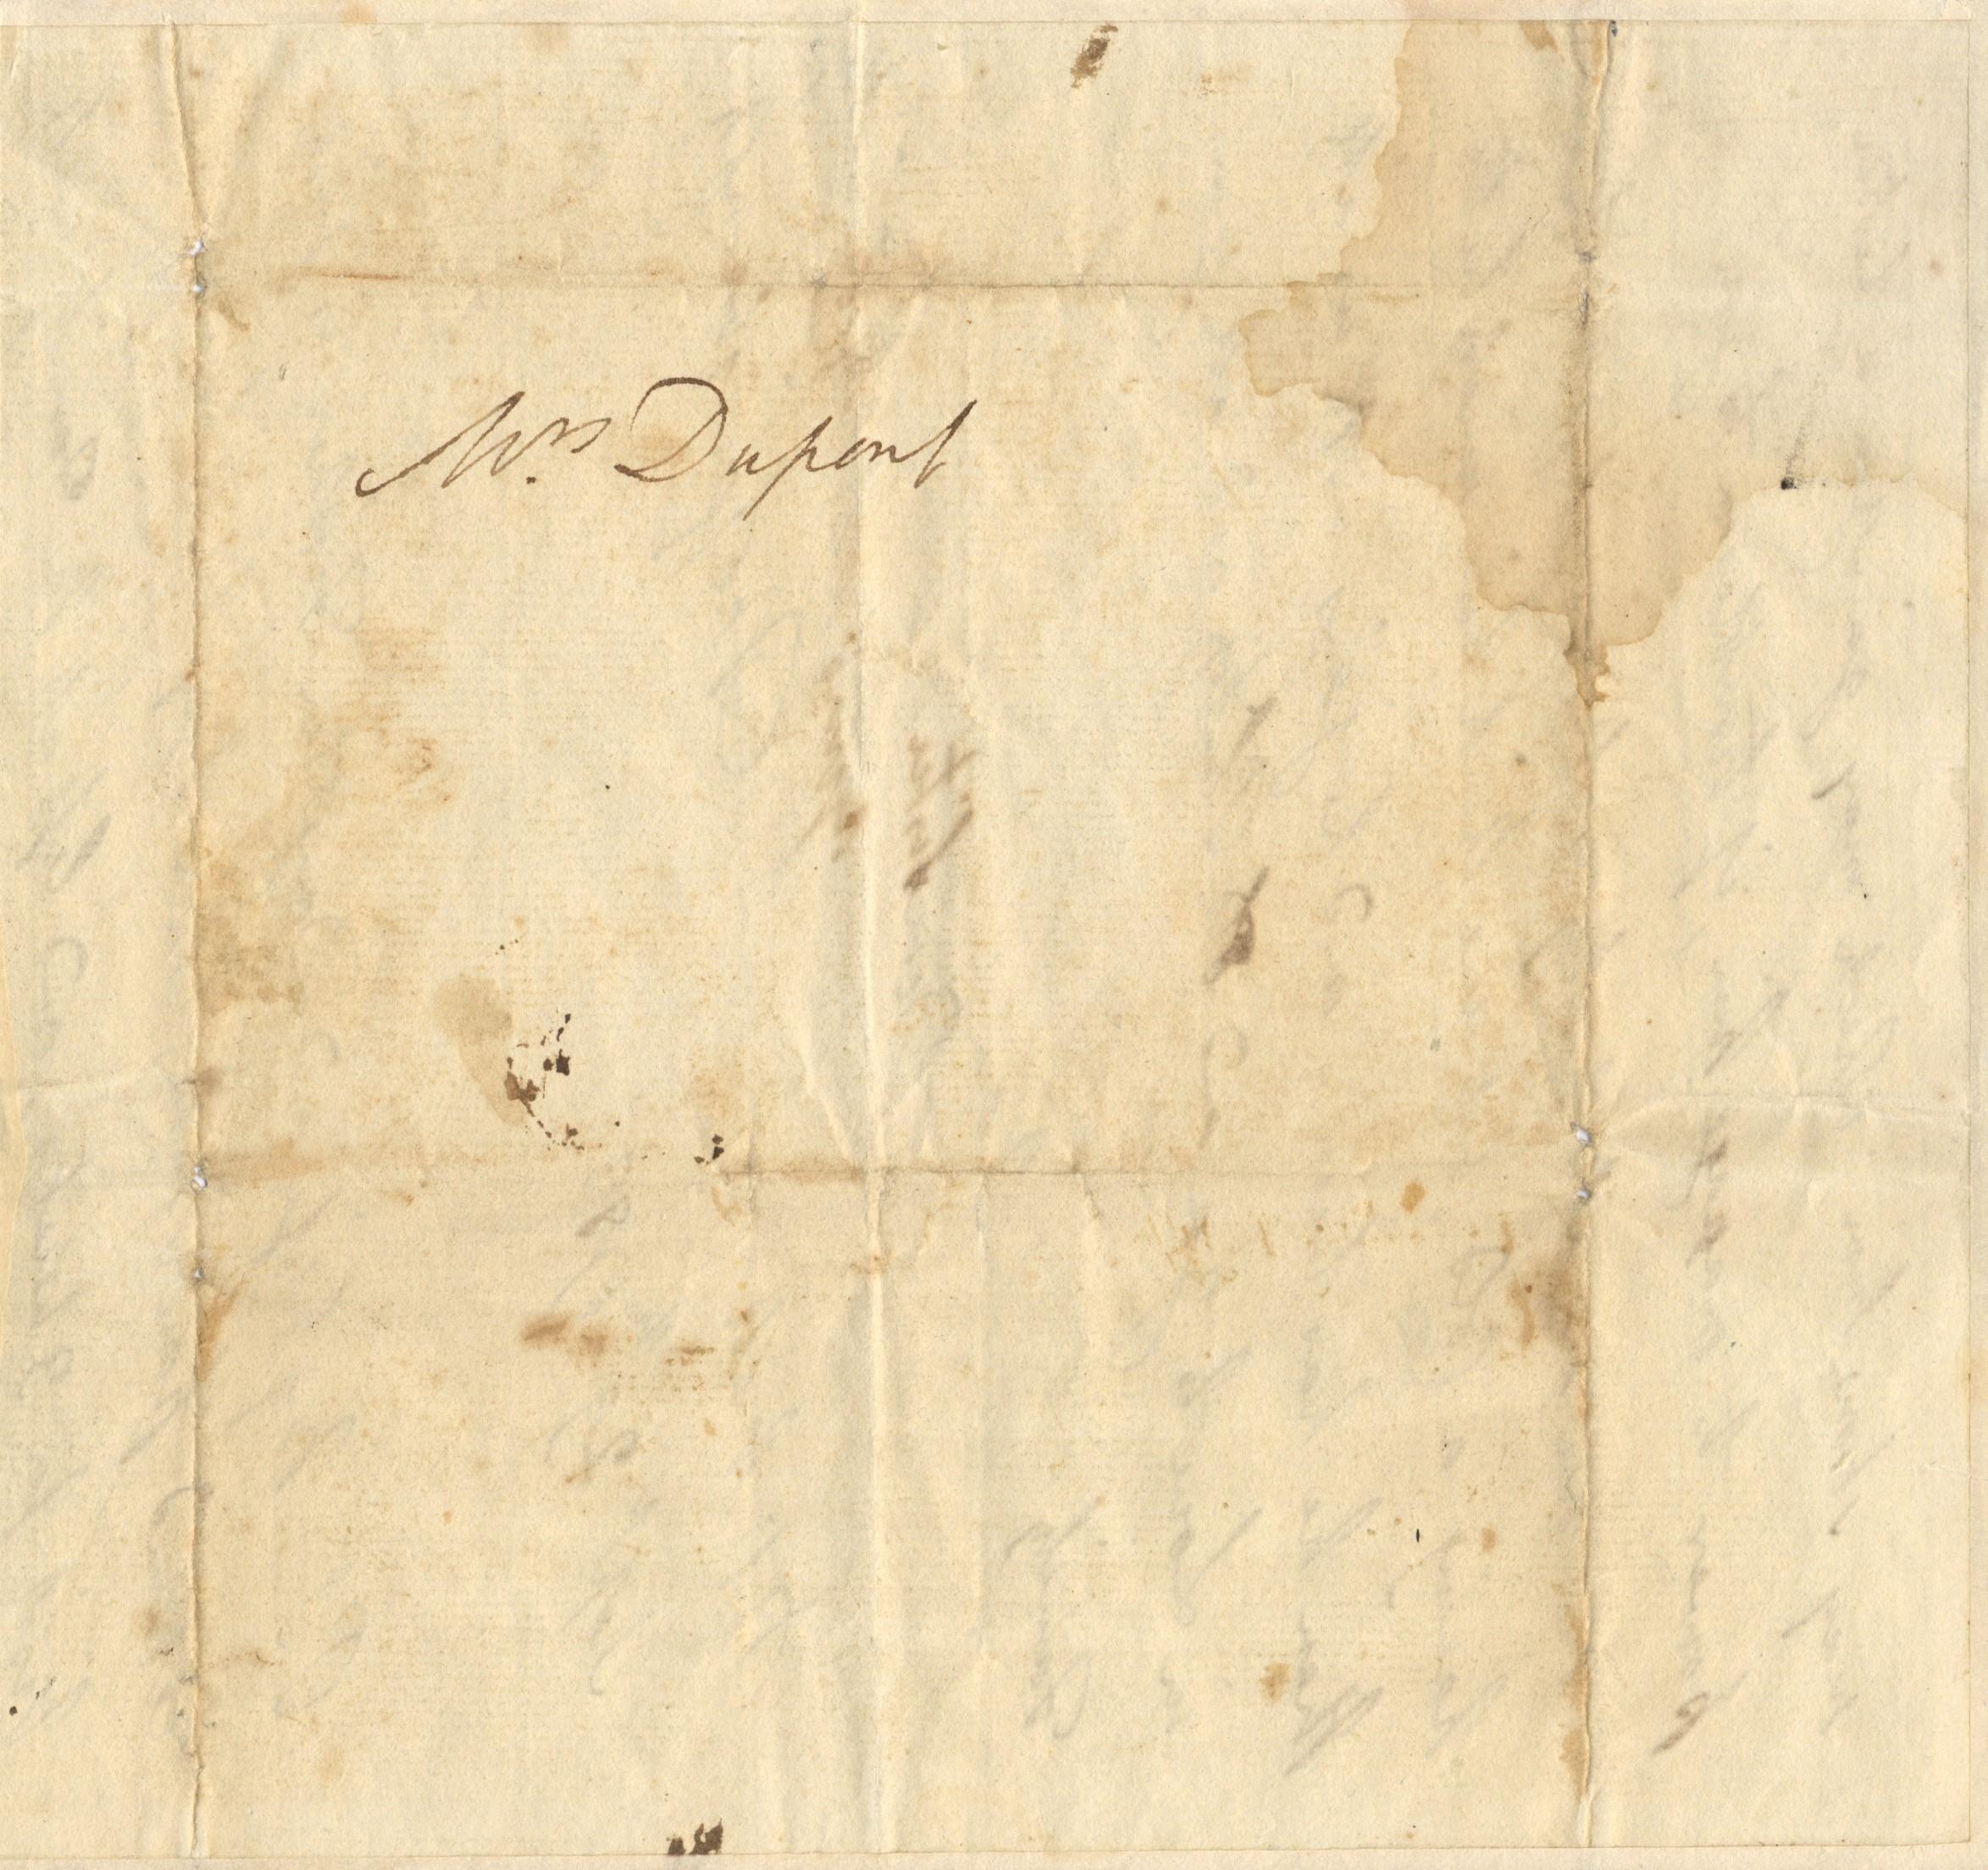 Lot 461 - GAINSBOROUGH THOMAS: (1727-1788) English Painter. A good, extremely rare A.L.S.